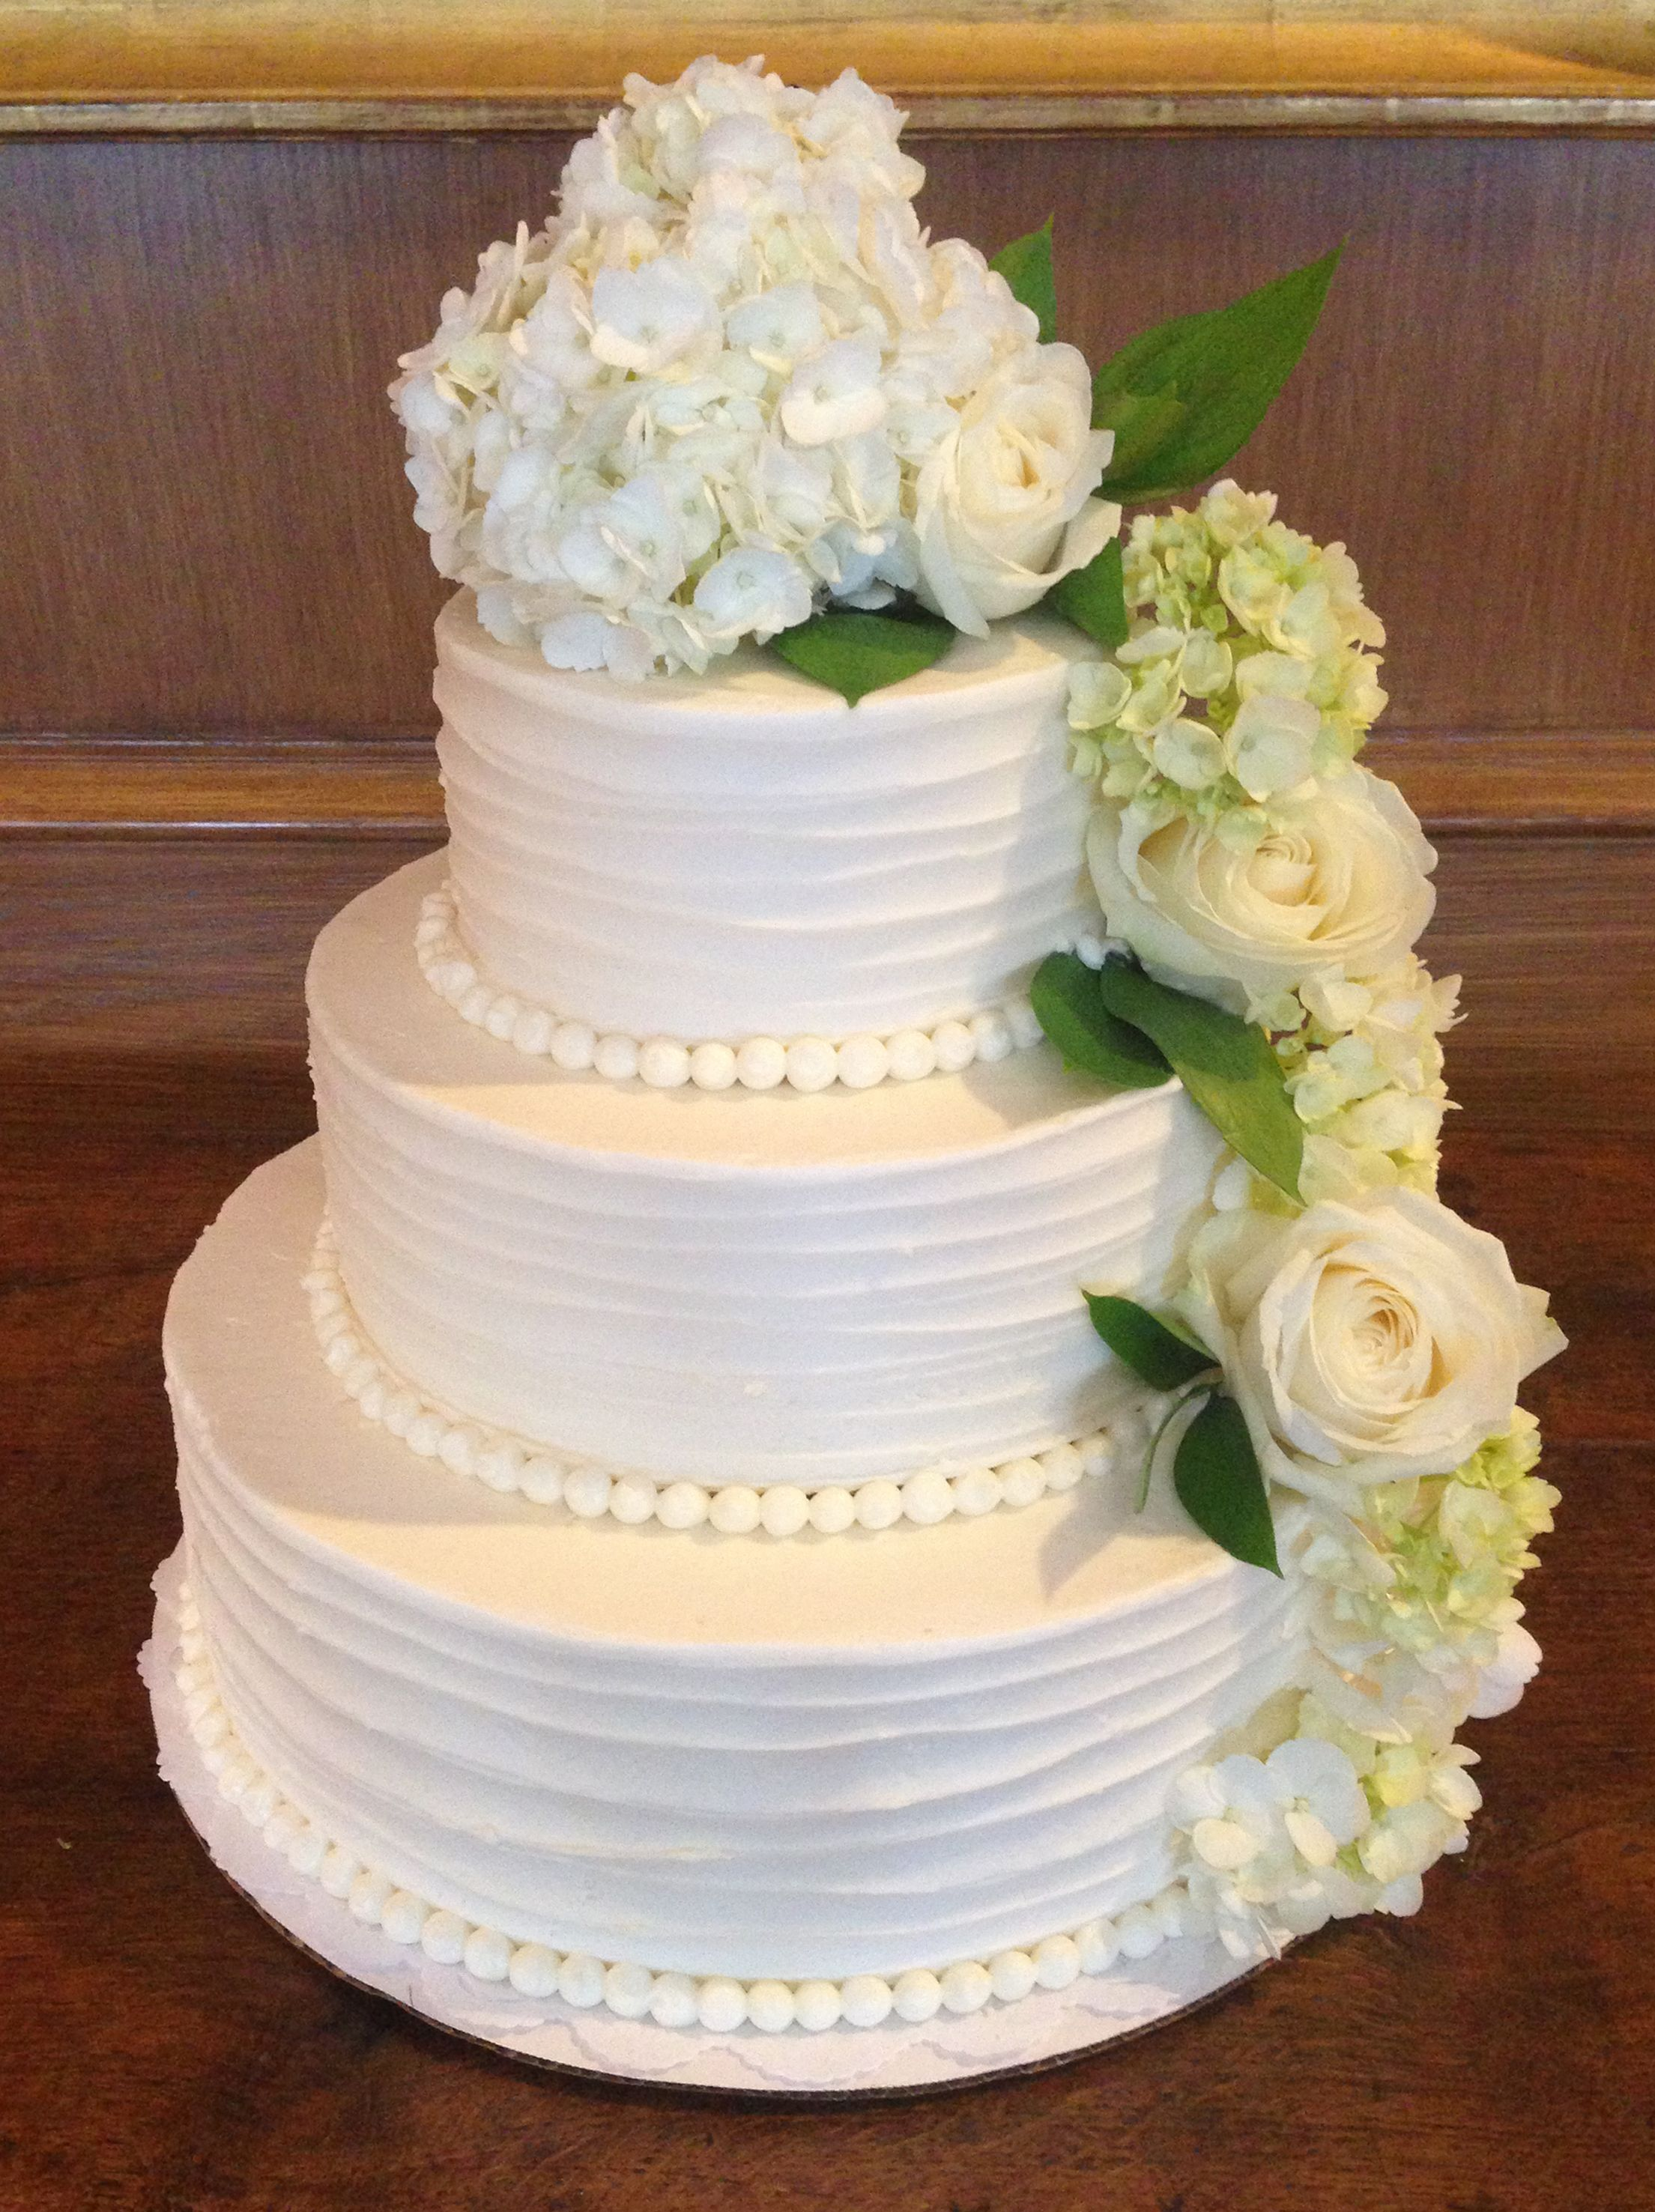 Simple Elegant Wedding Cake W Flowers Wedding Cake Simple Elegant Wedding Cake Simple Elegant Classy Simple Wedding Cake